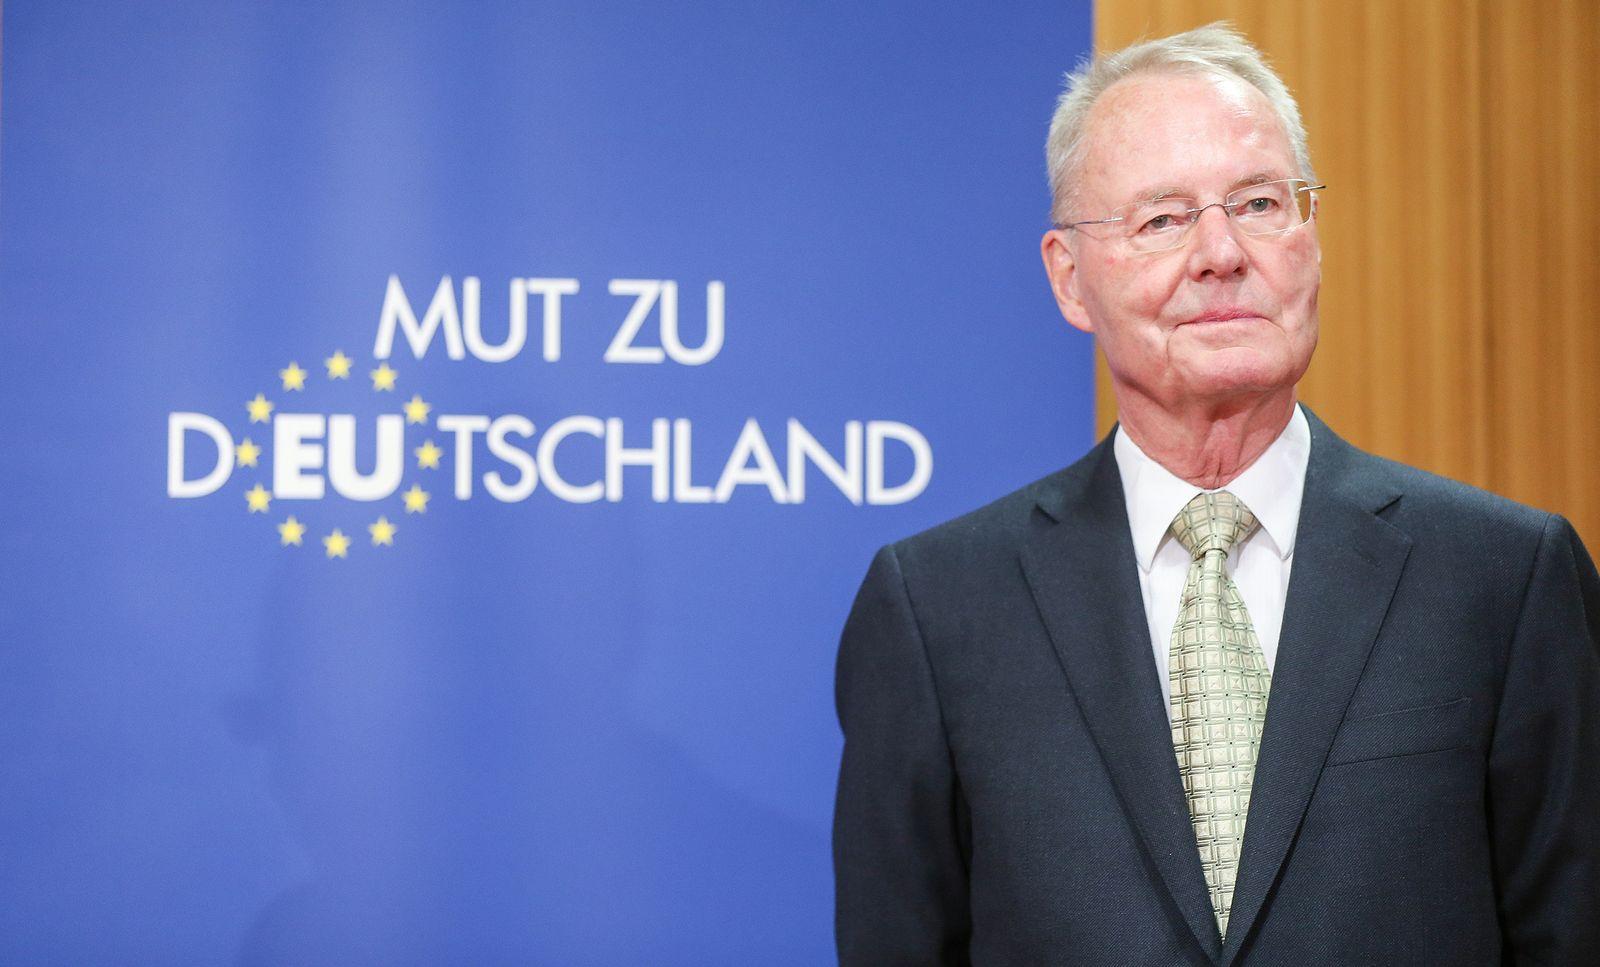 Afd nach Europawahl / Hans-Olaf Henkel